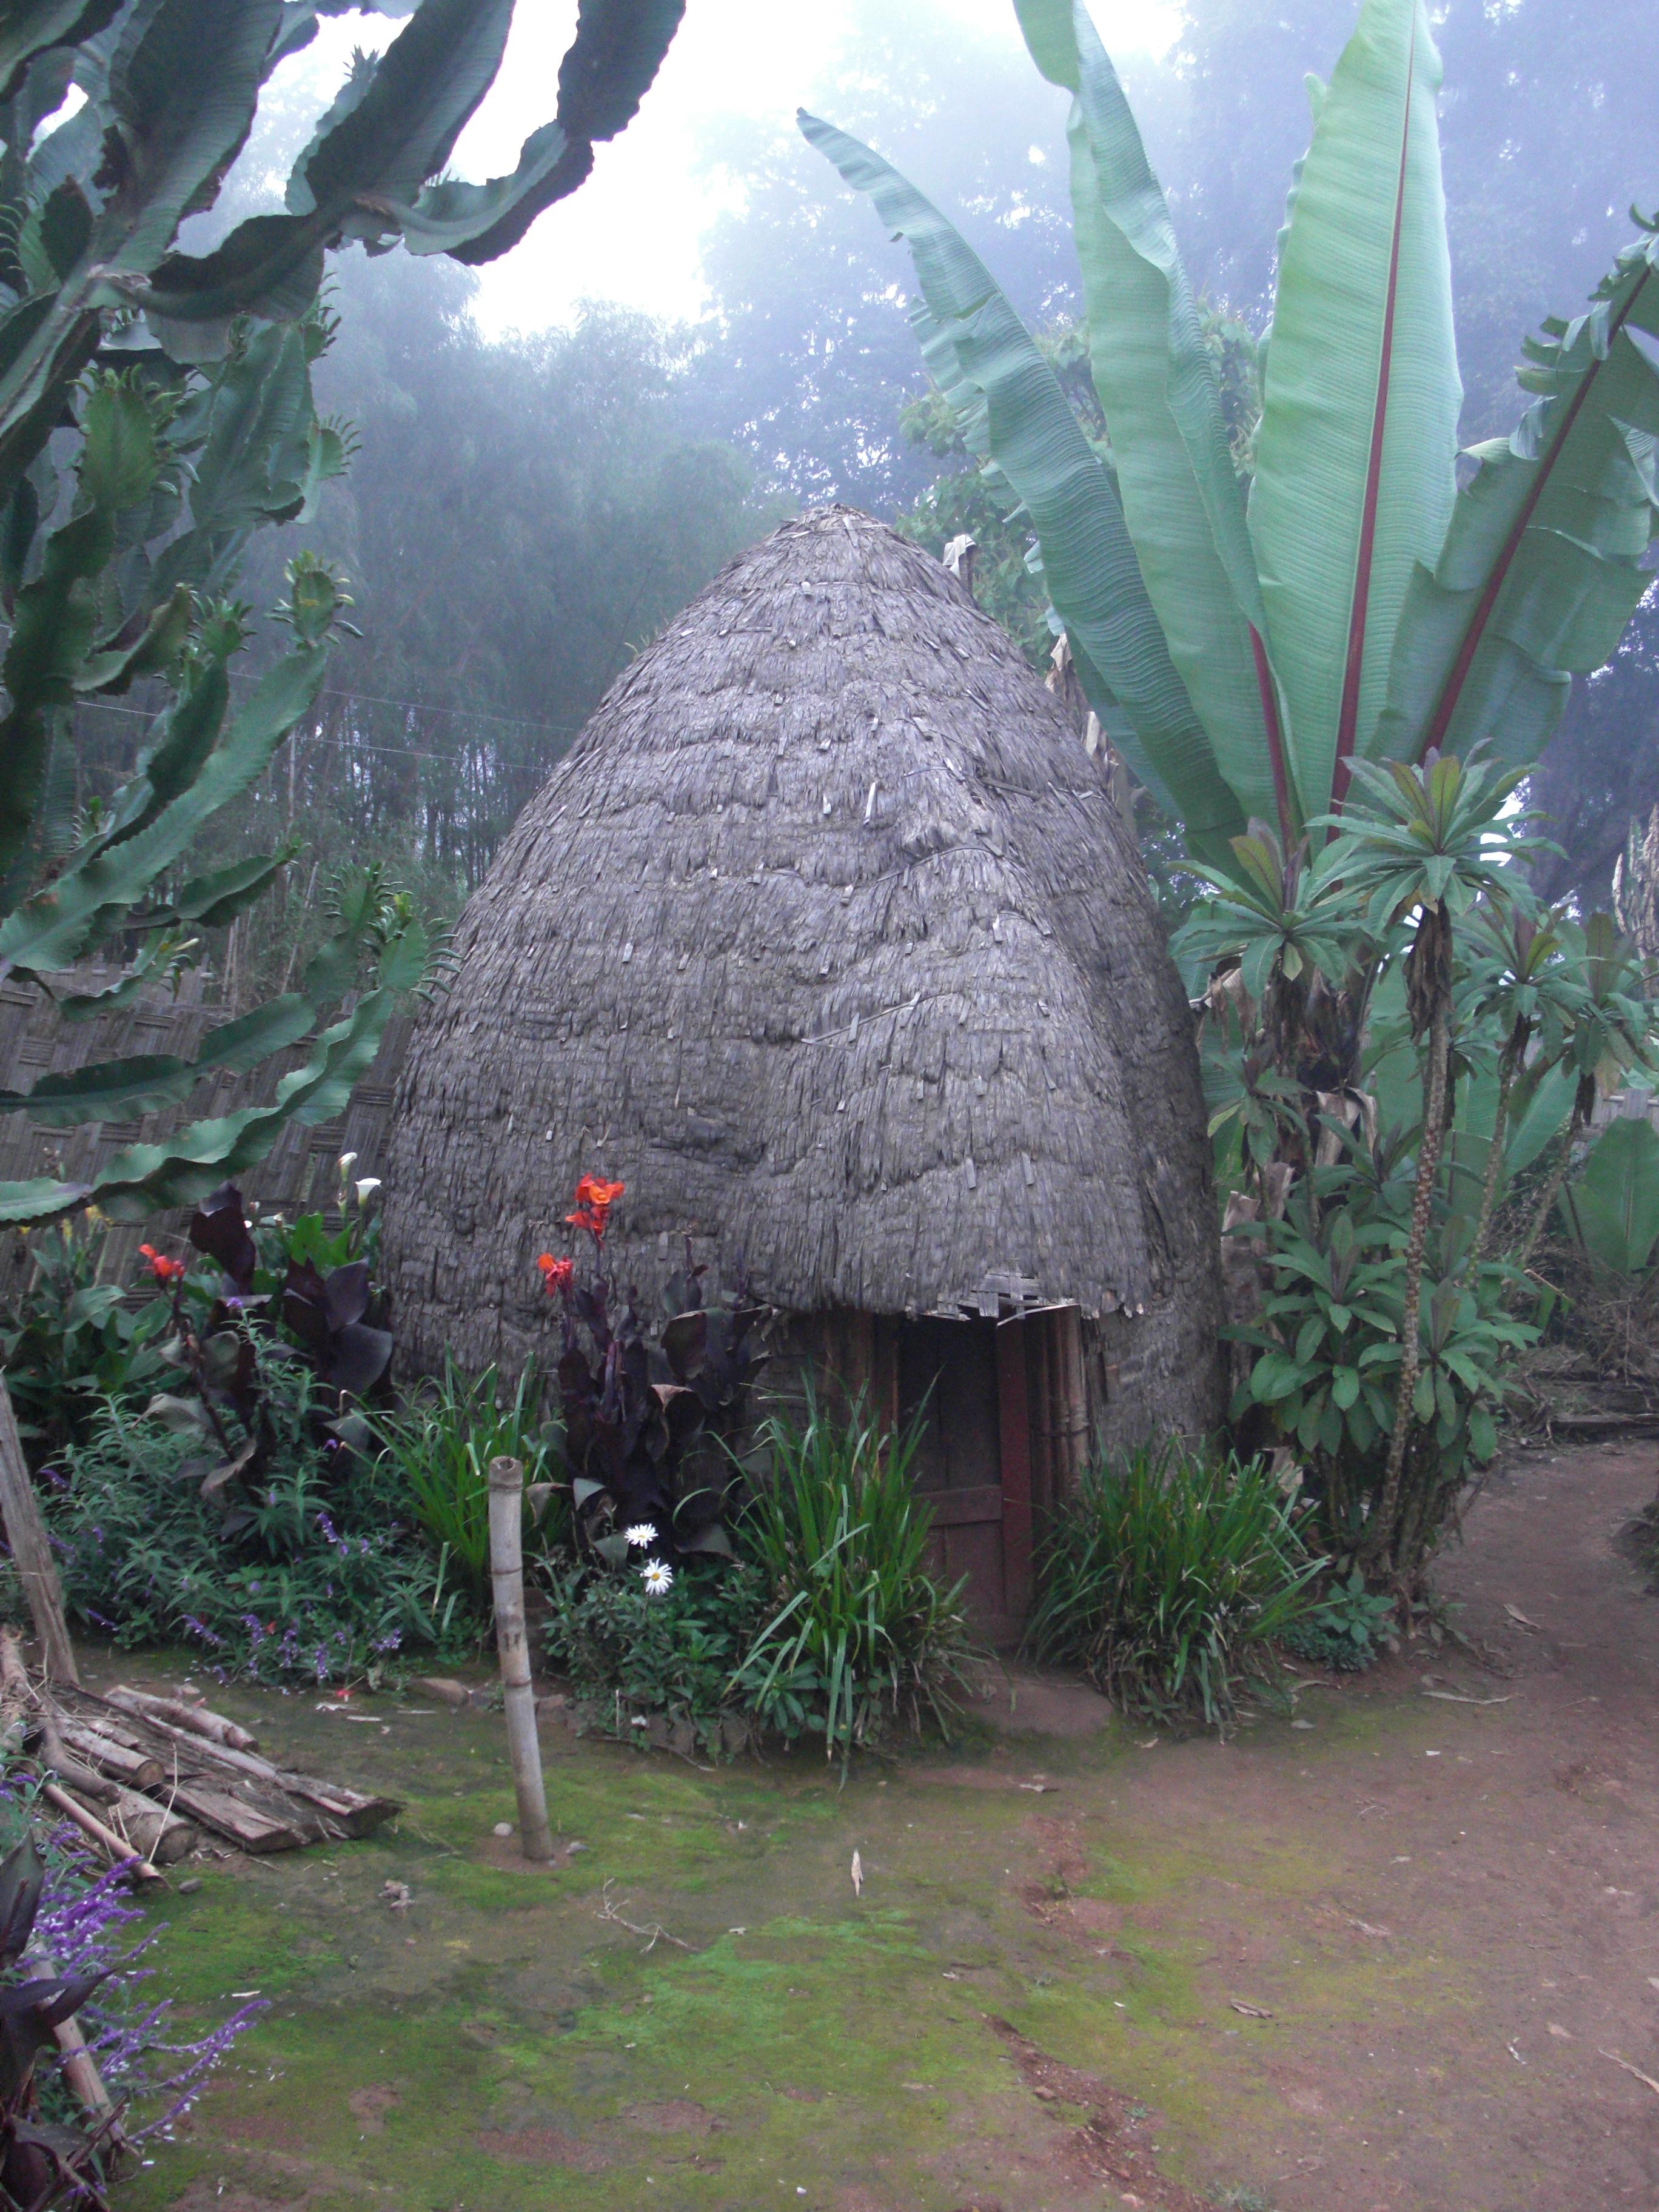 Elephant hut in Ethiopia